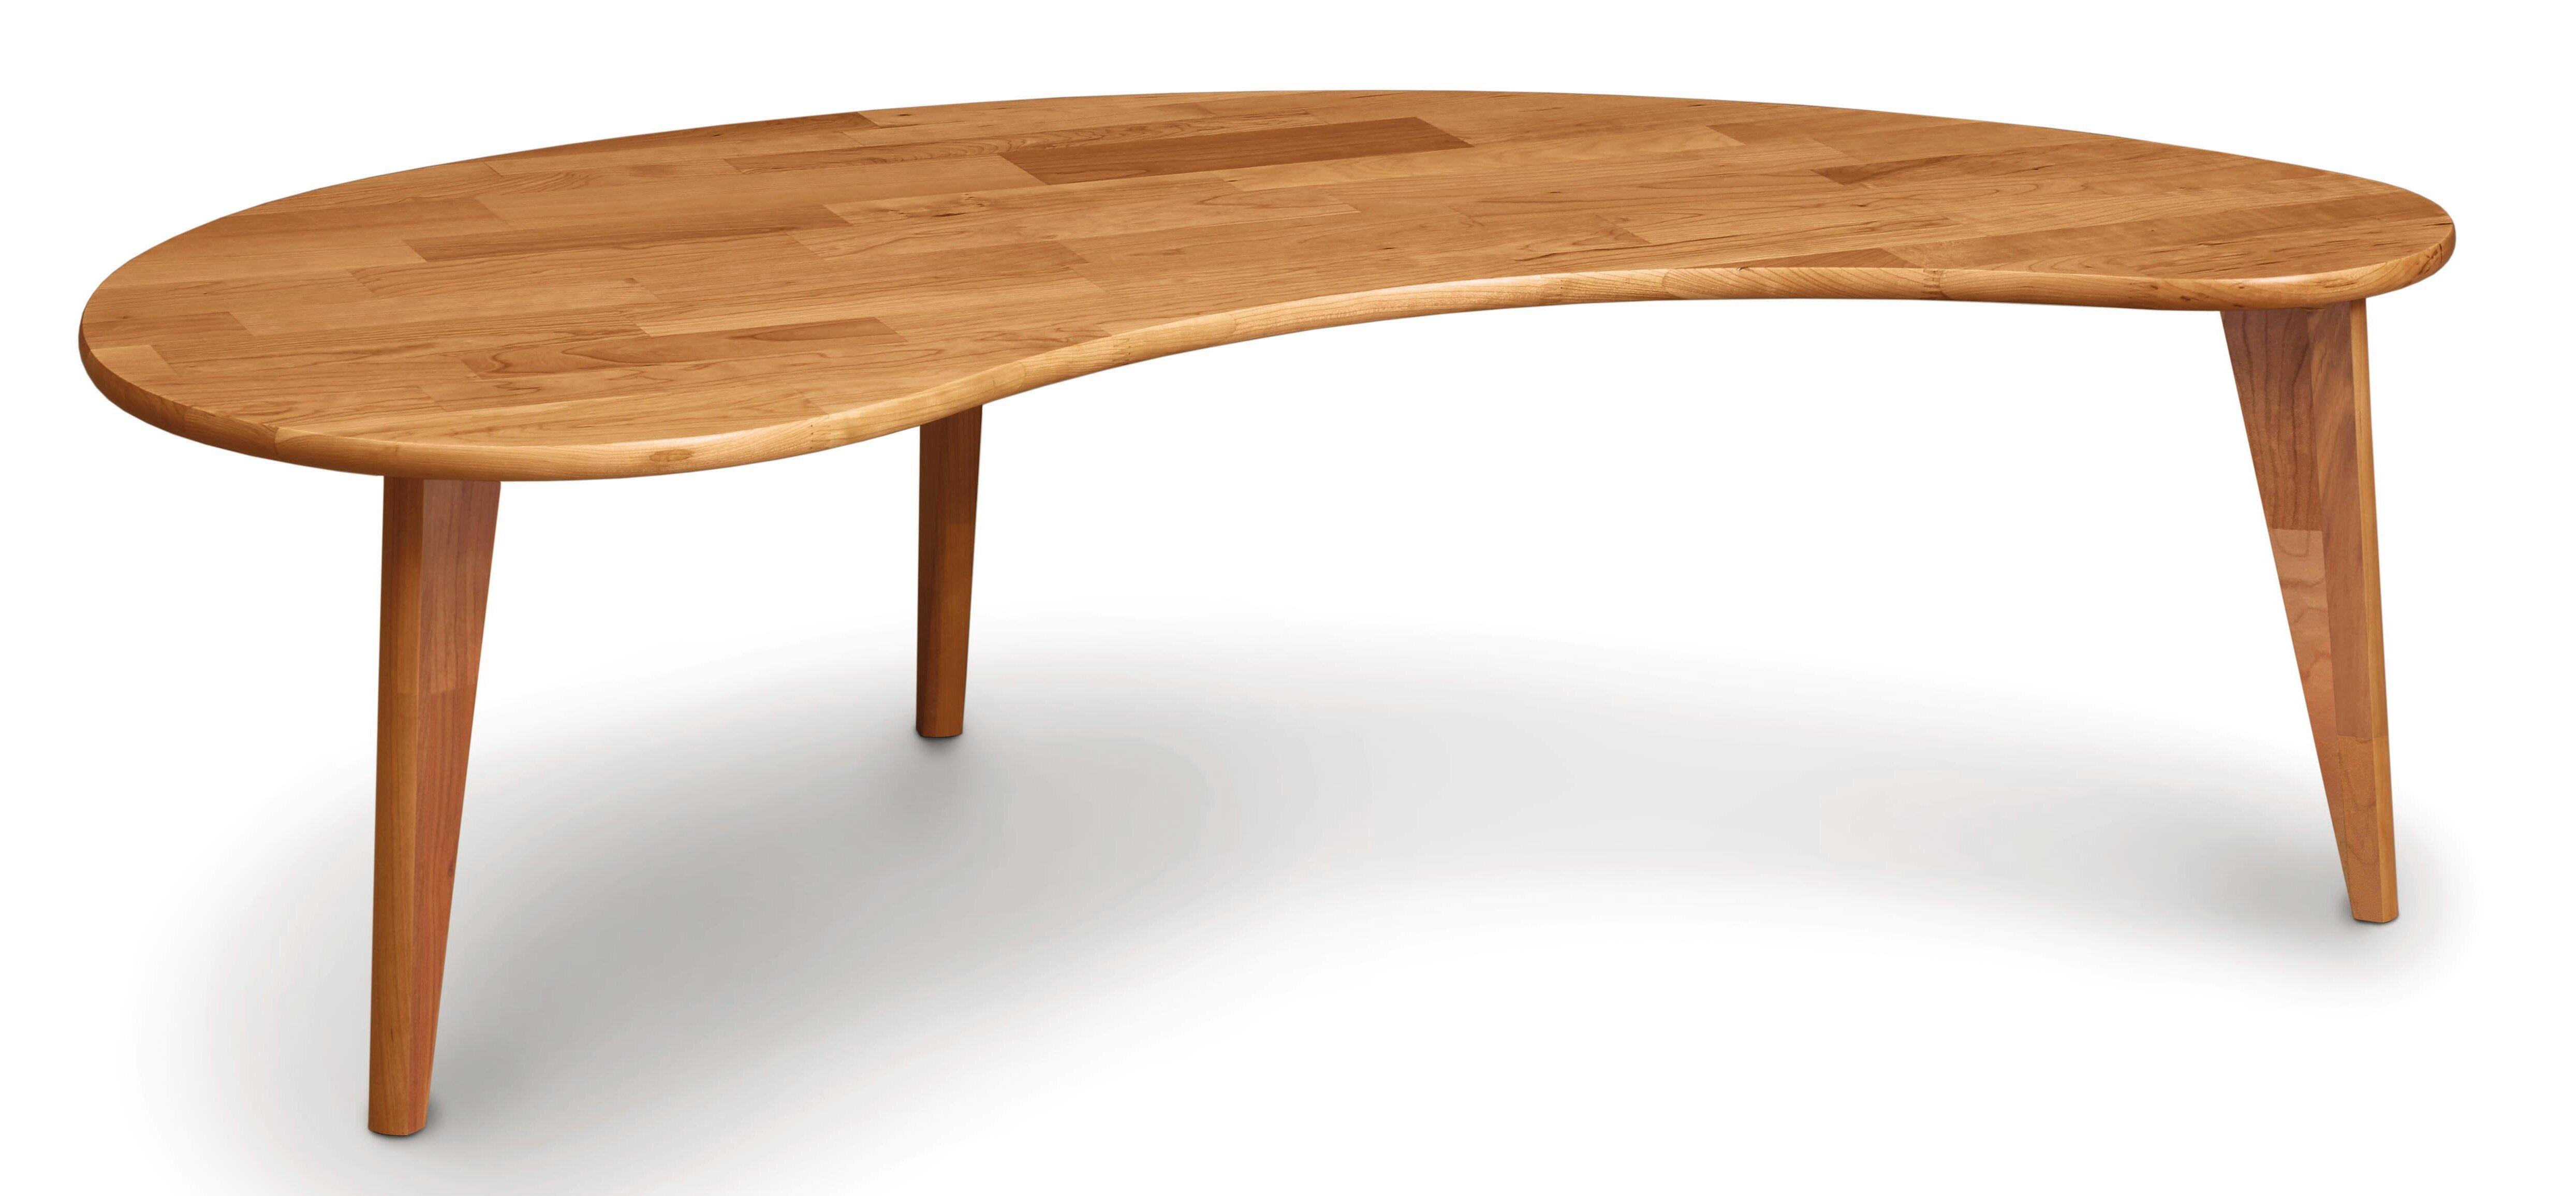 - Copeland Furniture Essentials Kidney Shaped Coffee Table Wayfair